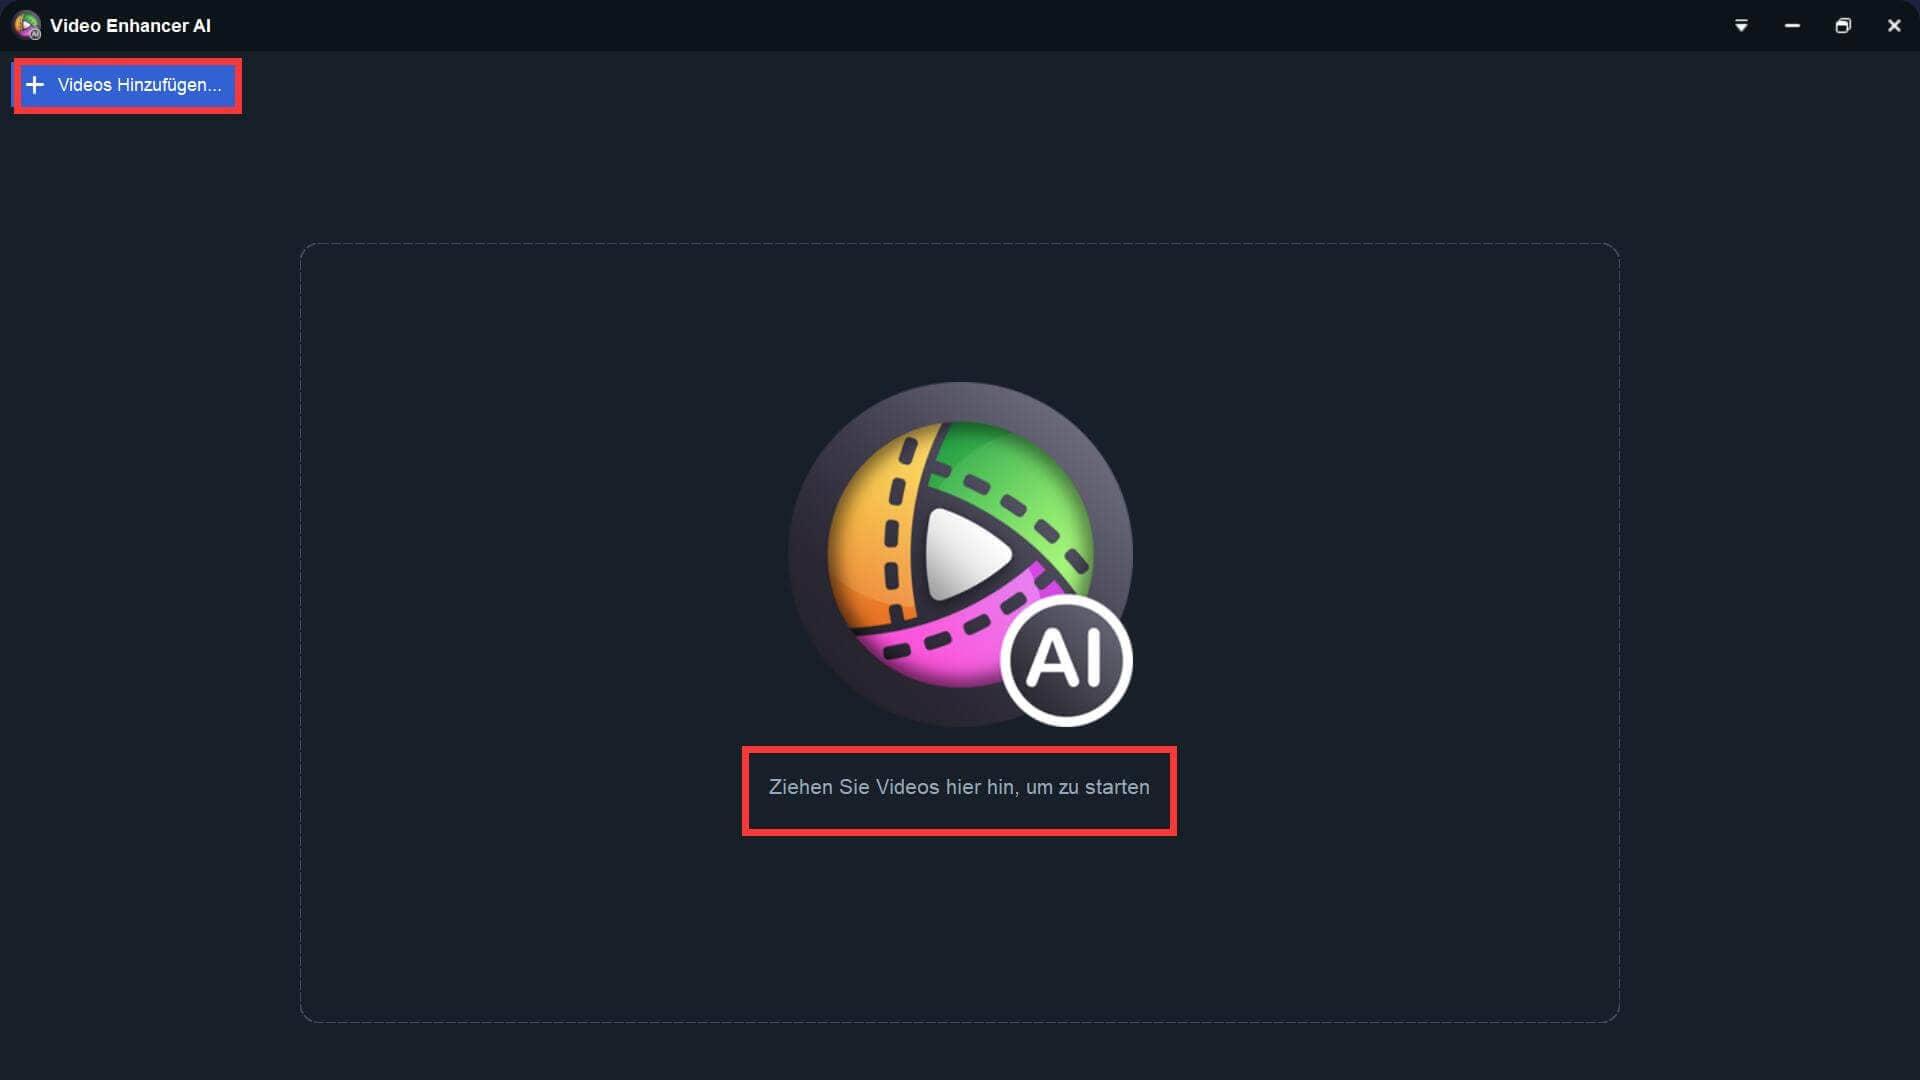 Video Enhancer AI Anleitung 1